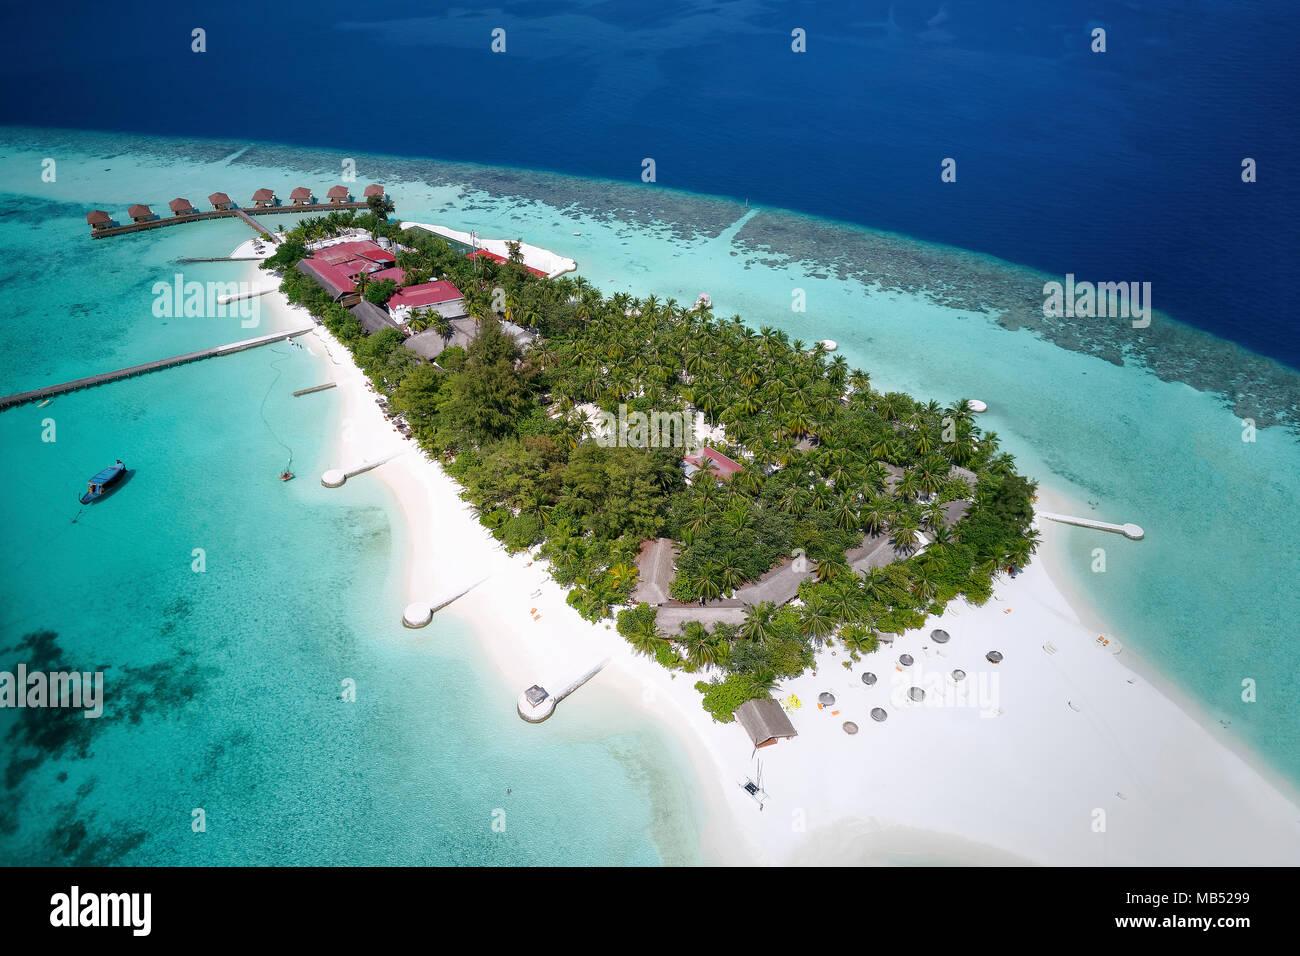 Mayaafushi Island Resort, offshore coral reef, Ari Atoll, Indian Ocean, Maldives - Stock Image